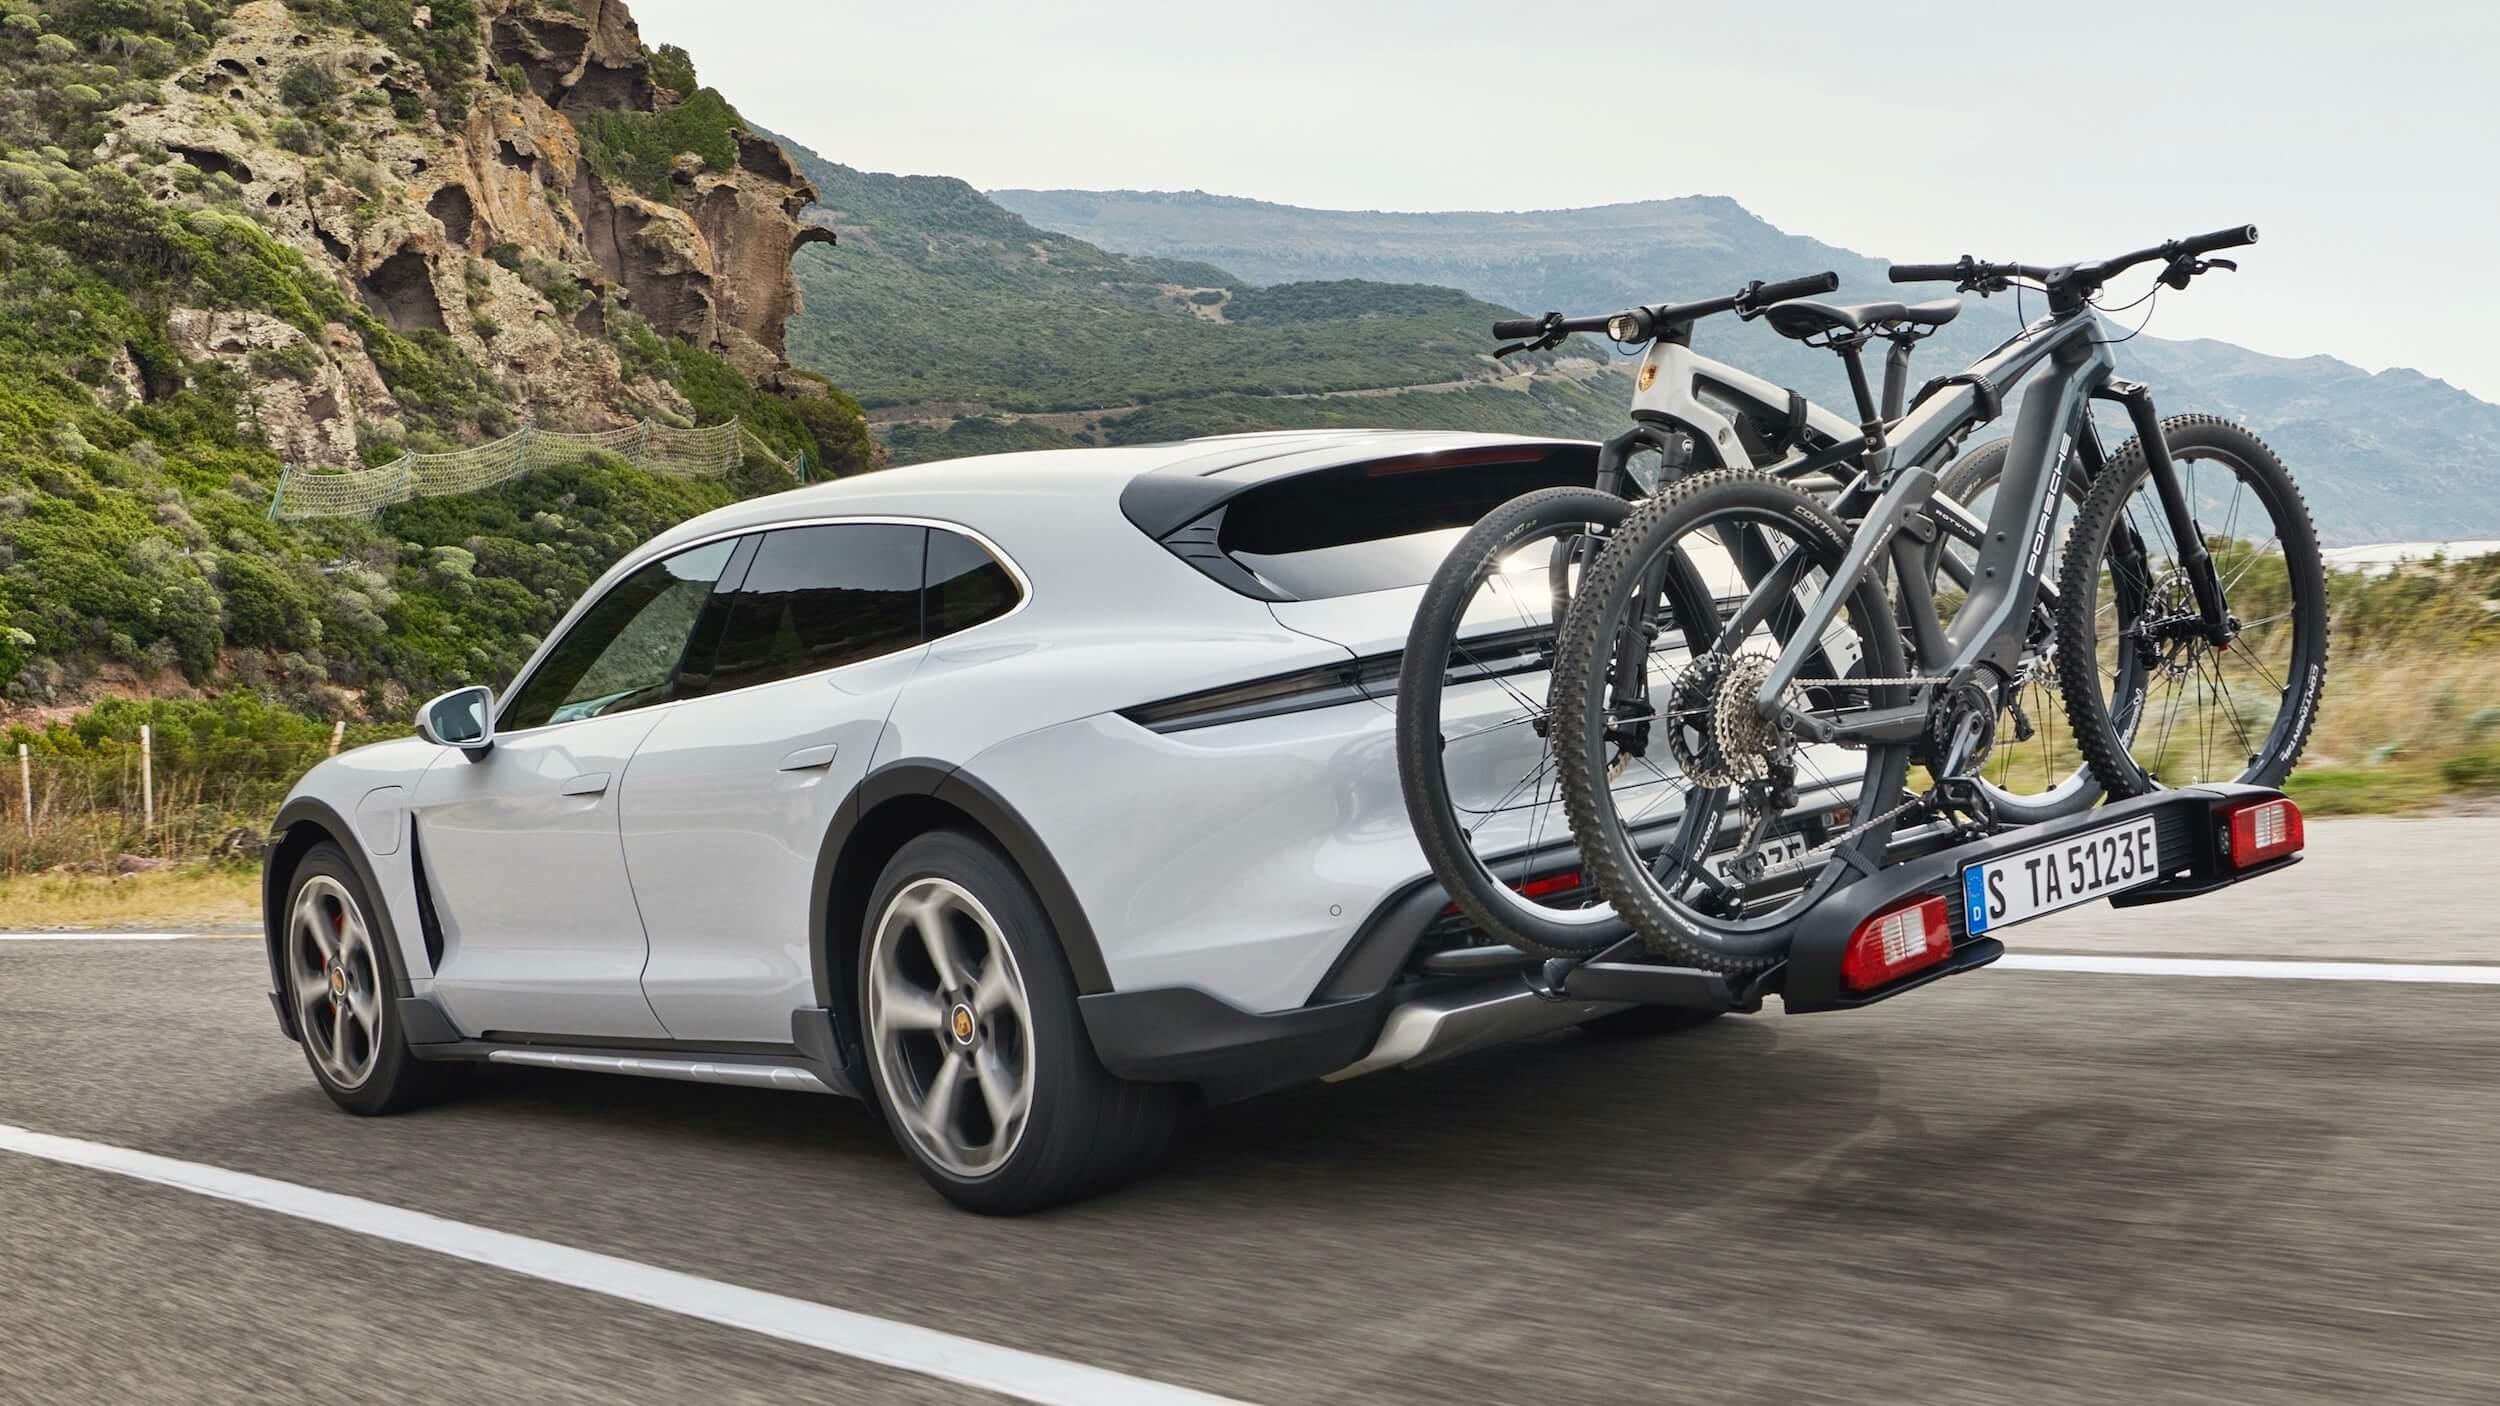 Porsche Taycan 4S Cross Turismo fietsendrager